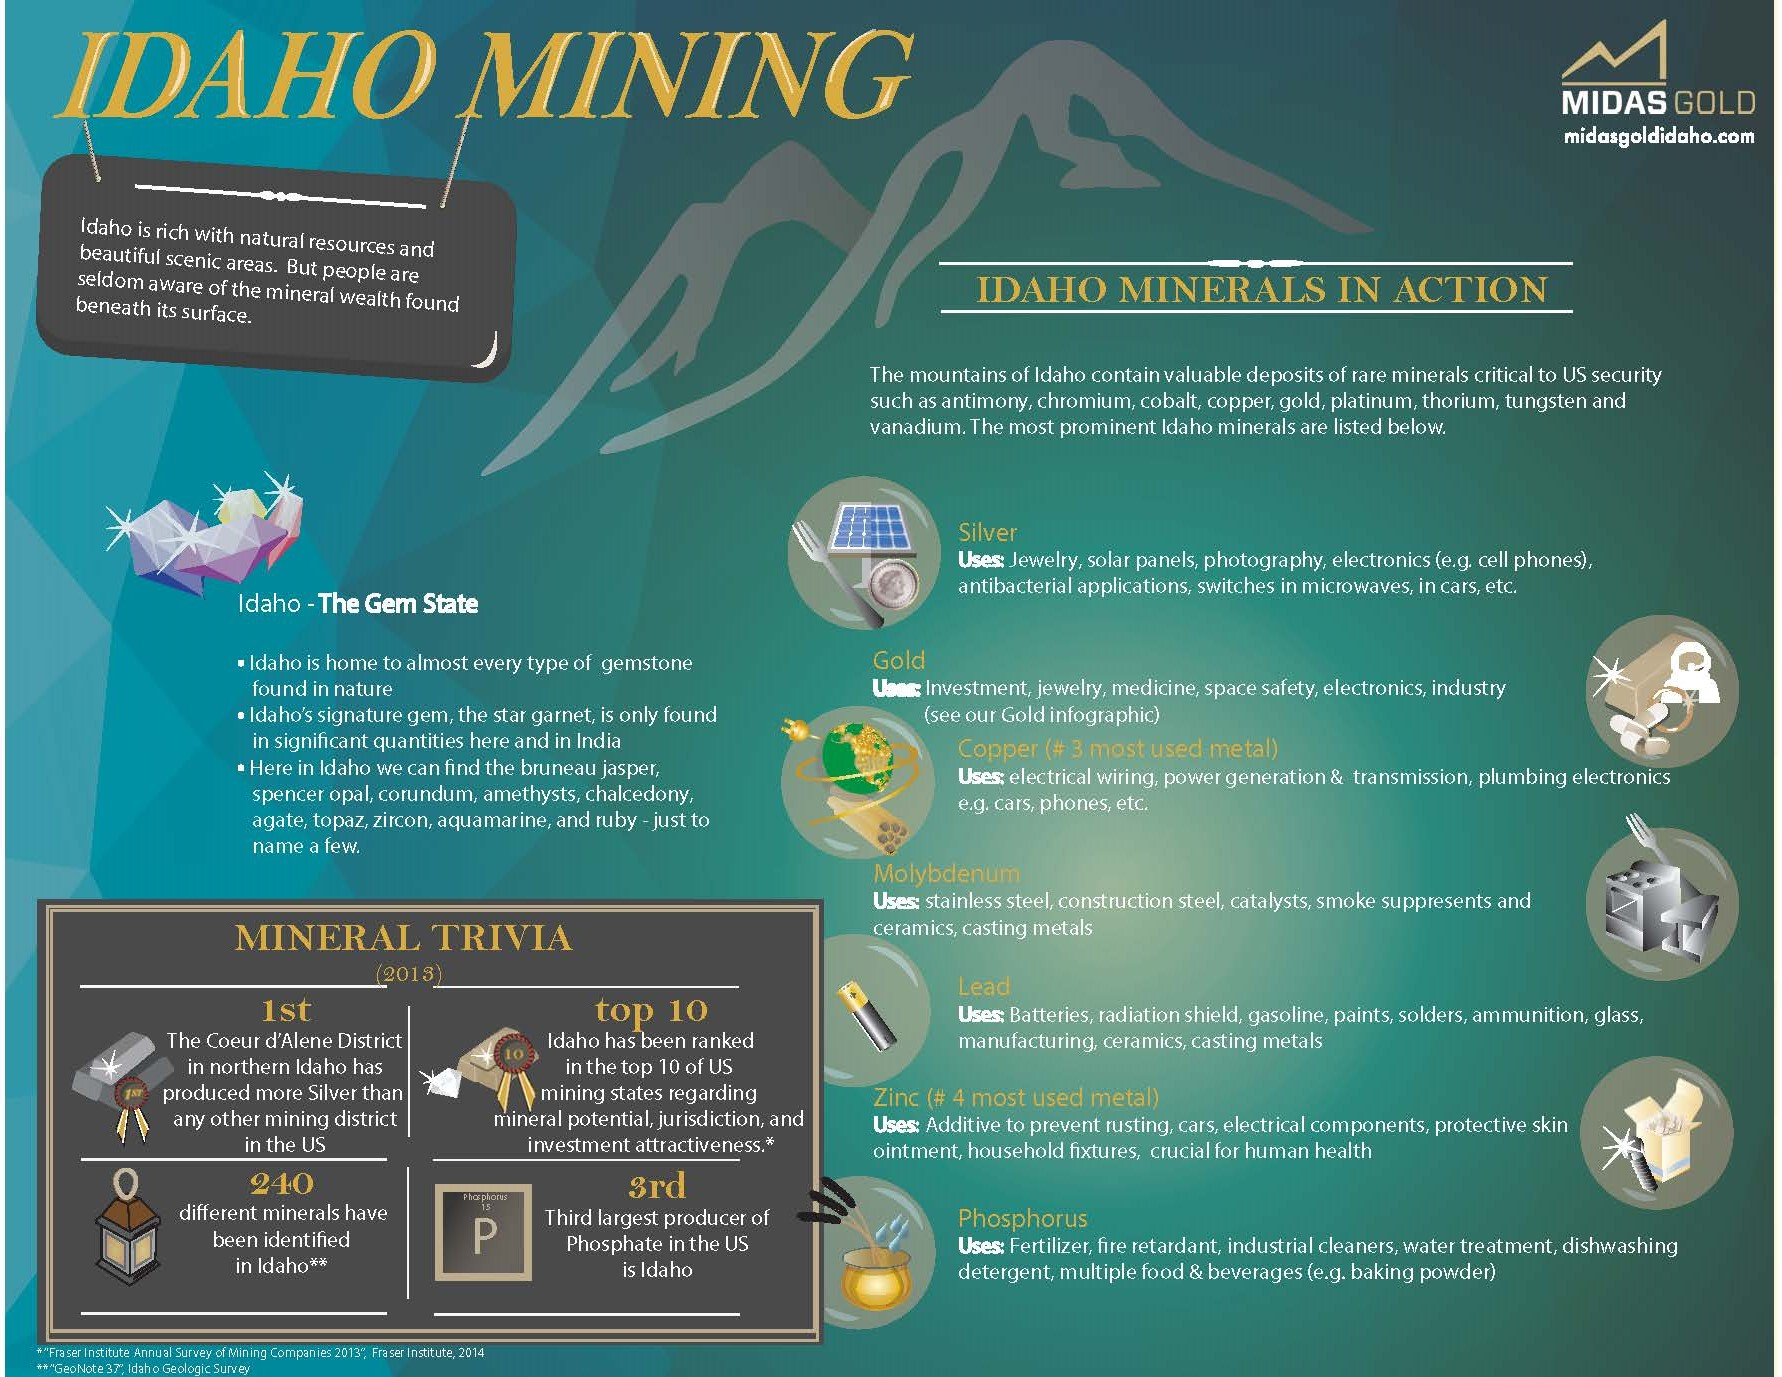 Midas Gold - Mining in Idaho Infographic